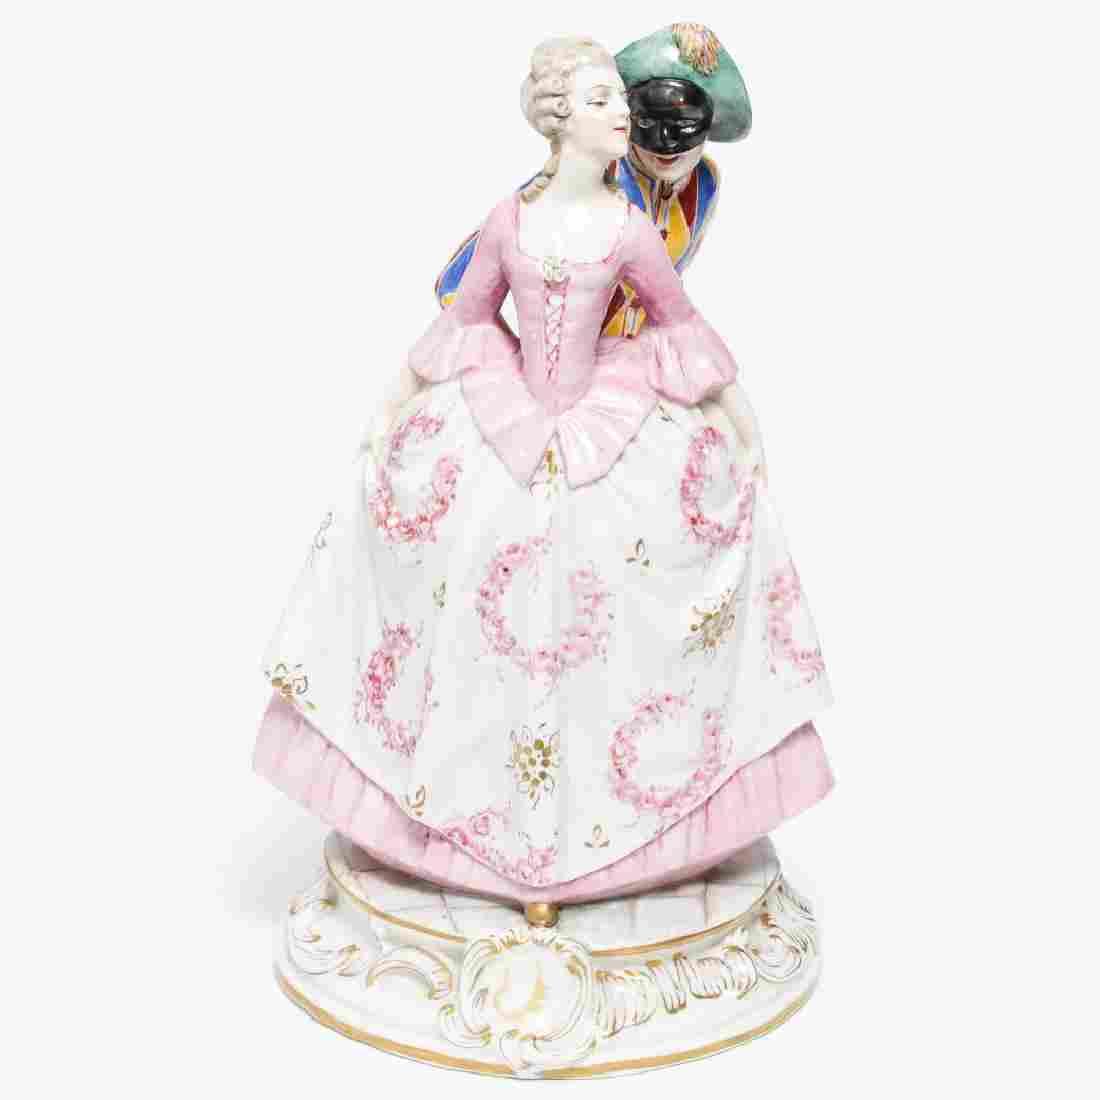 Capodimonte Harlequin & Lady Porcelain by L Fabris